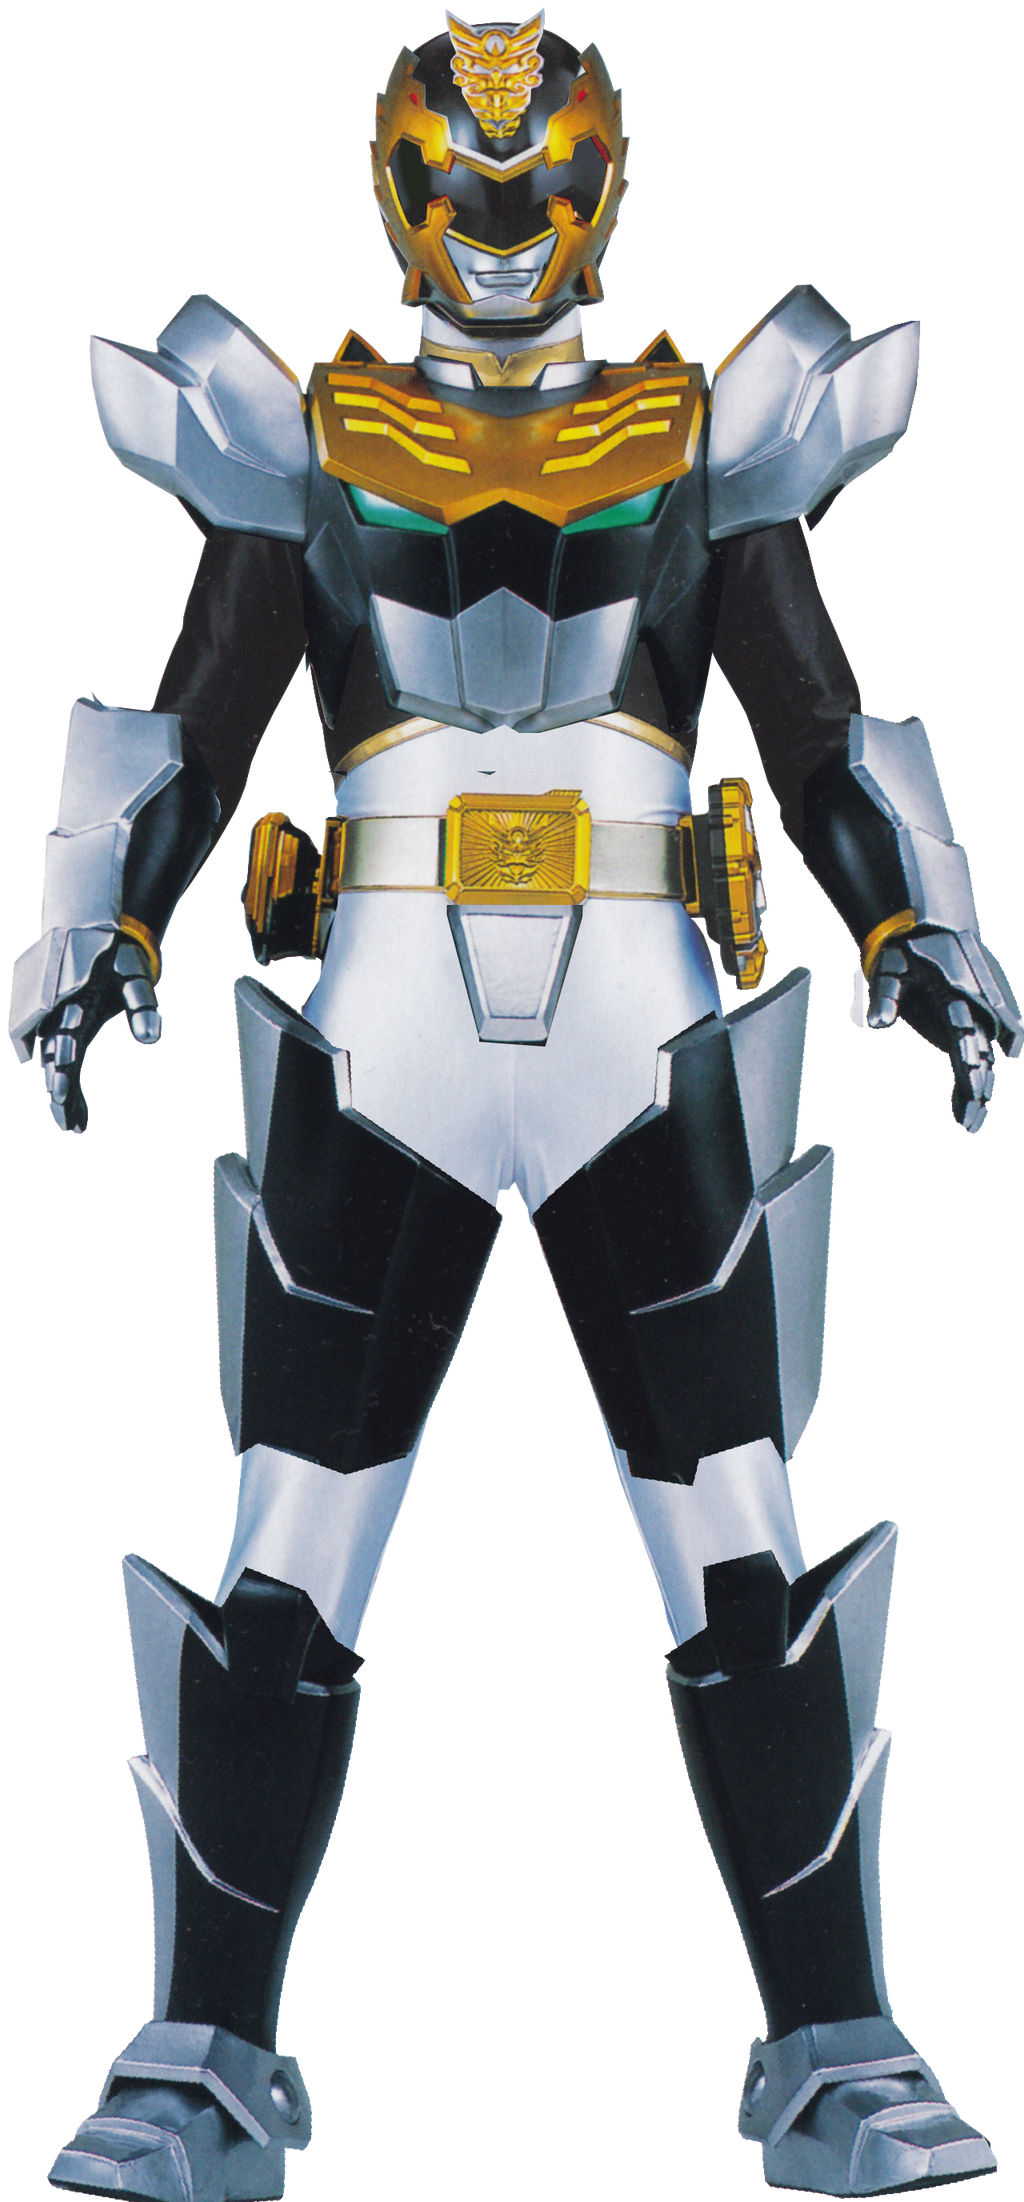 Gosei black groundion armor by levi810 on deviantart - Robot power rangers megaforce ...